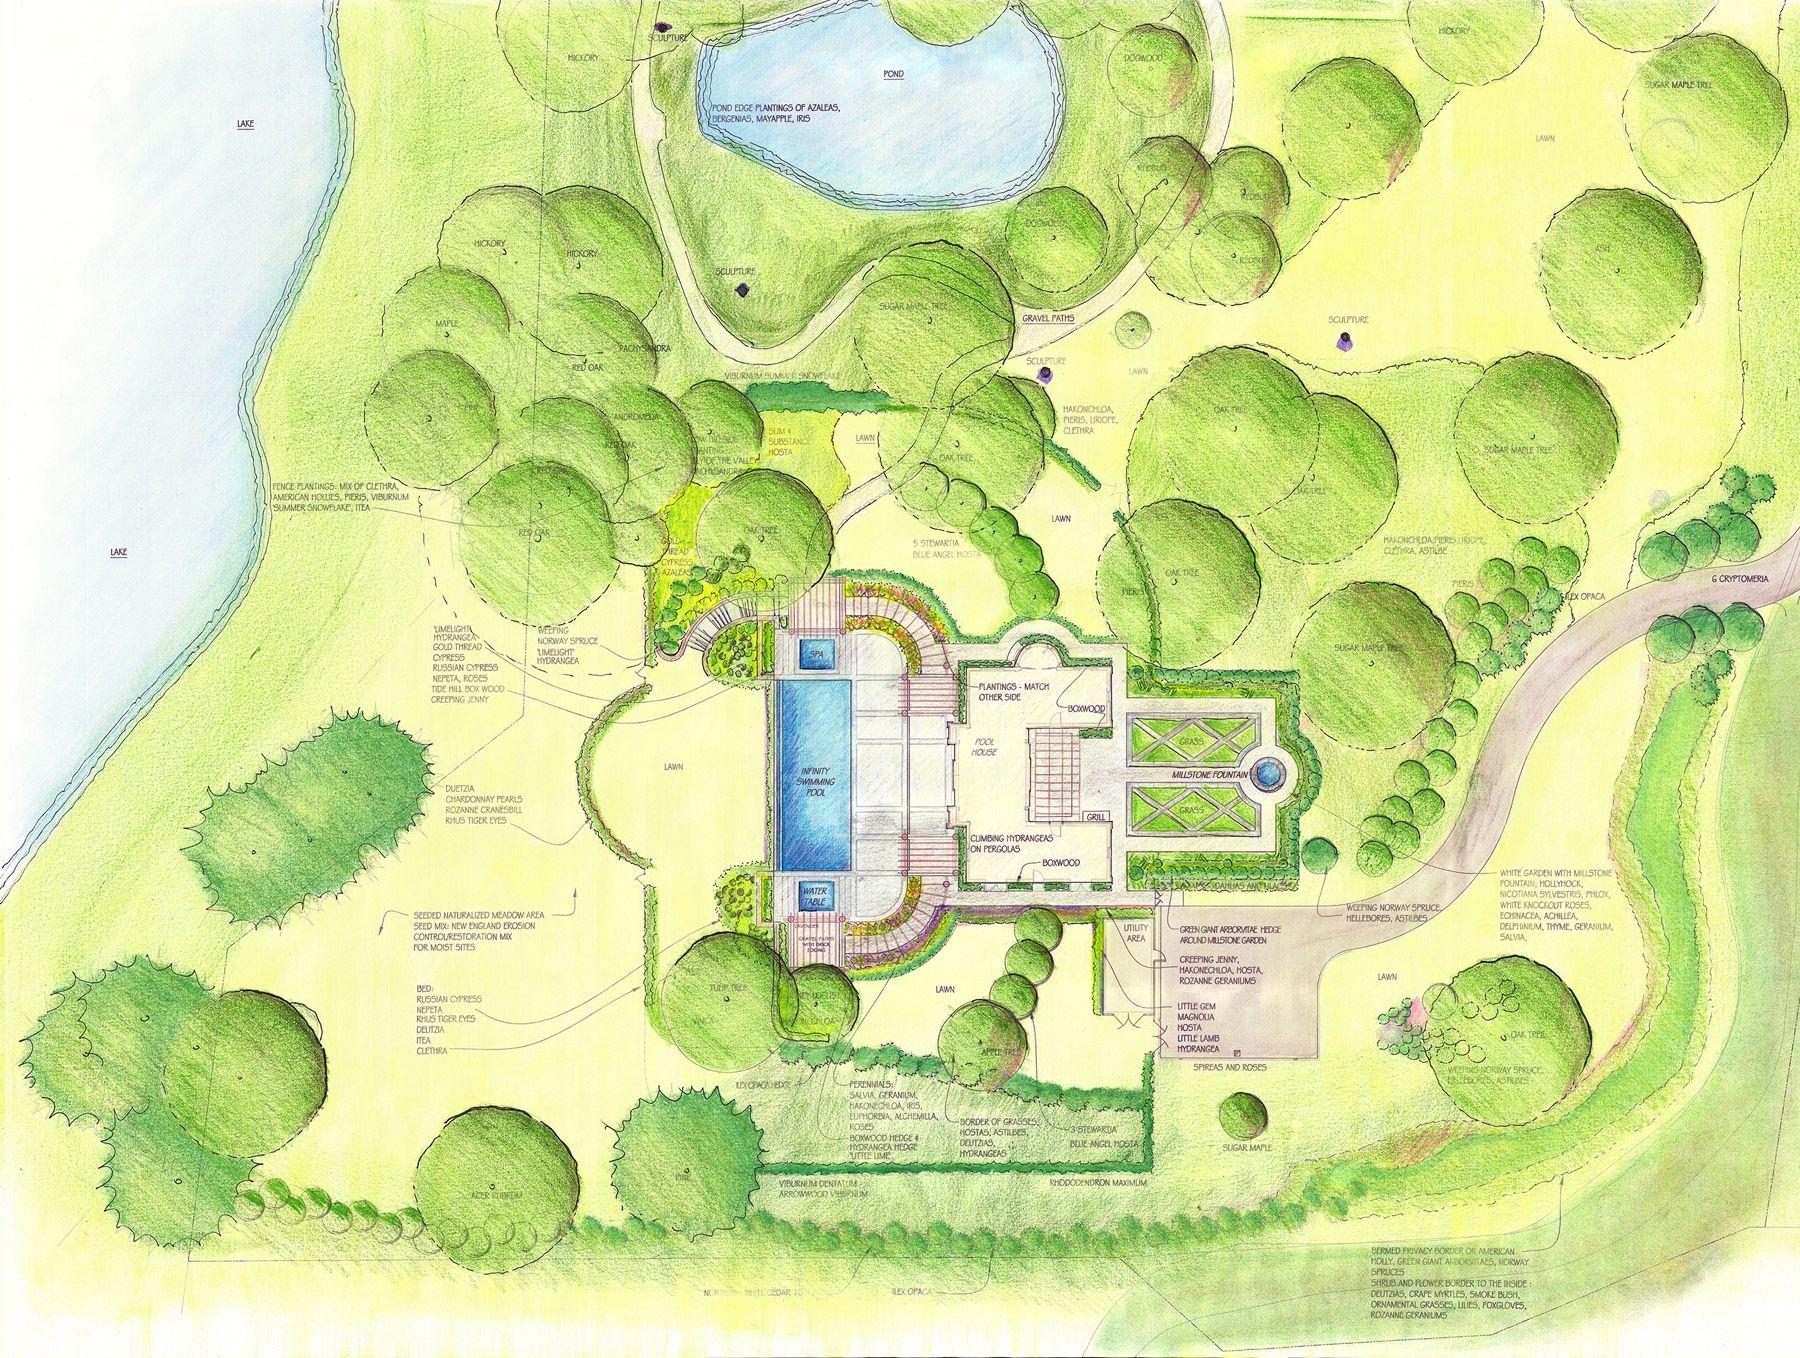 Art Drawing Rendering Colored Pencil Landscape Garden Design Illustration Plan Pool Planting Architect